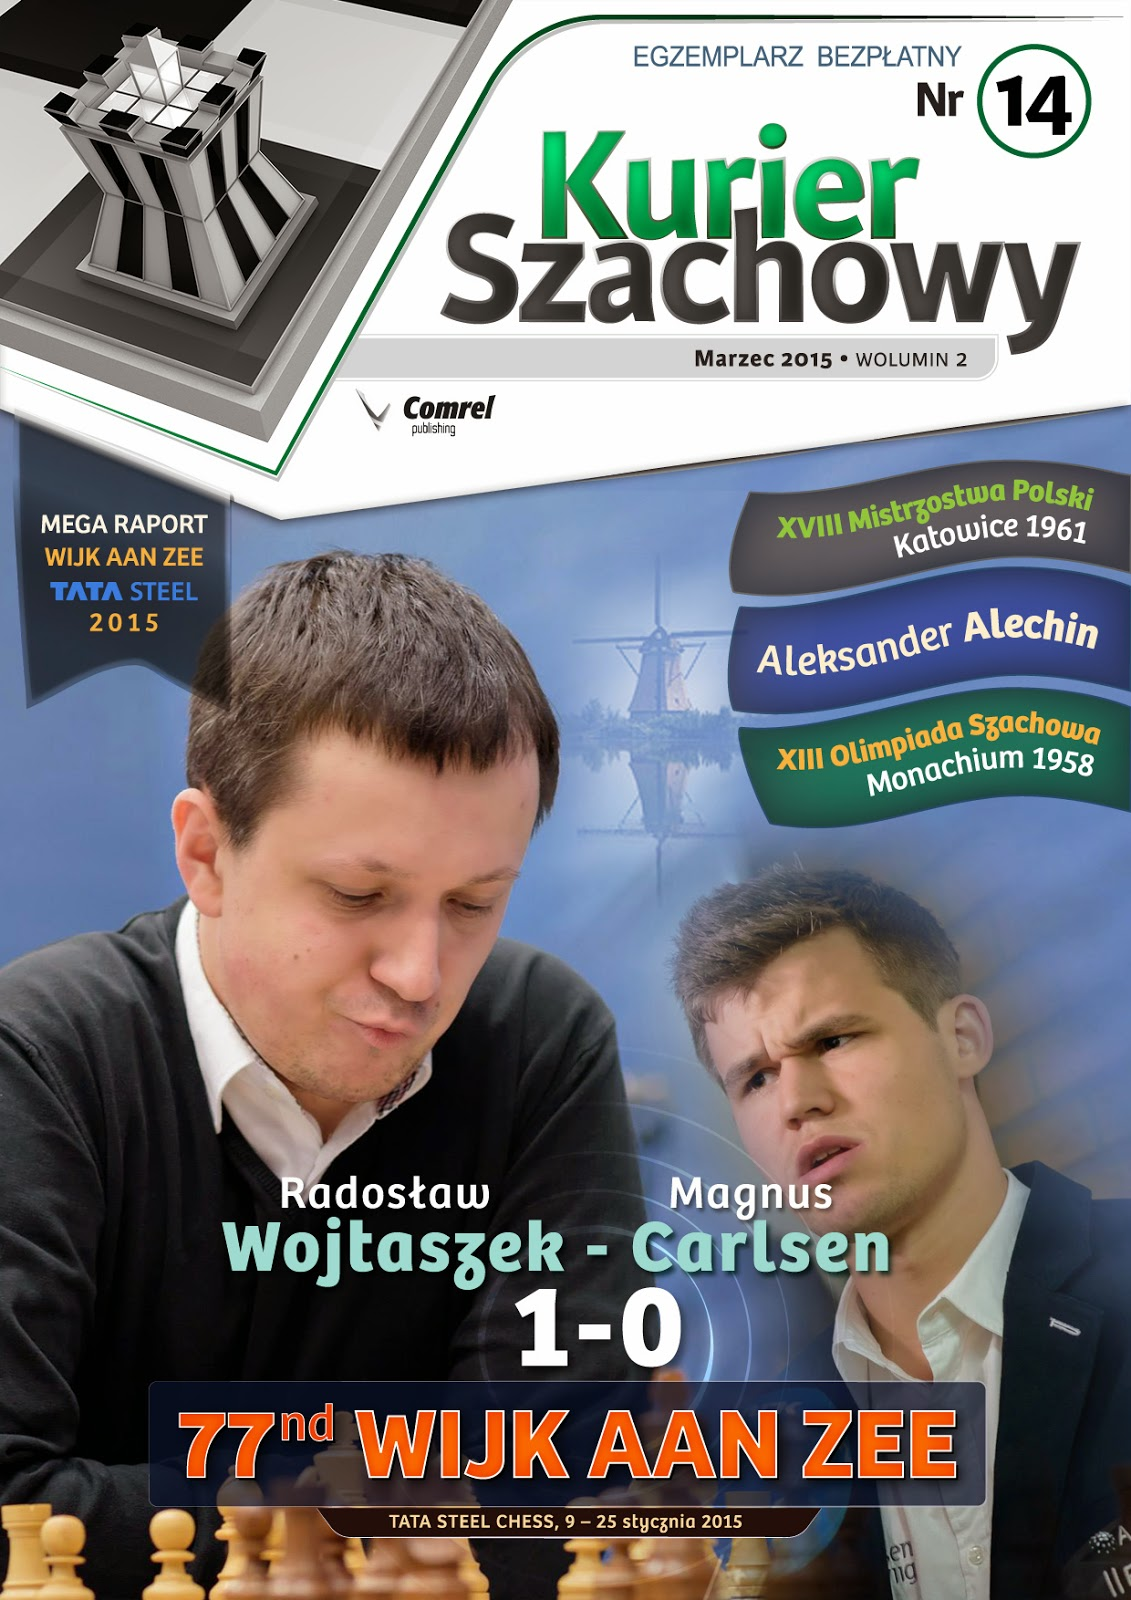 http://comrel.pl/kurier/0014_Kurier_Szachowy.pdf